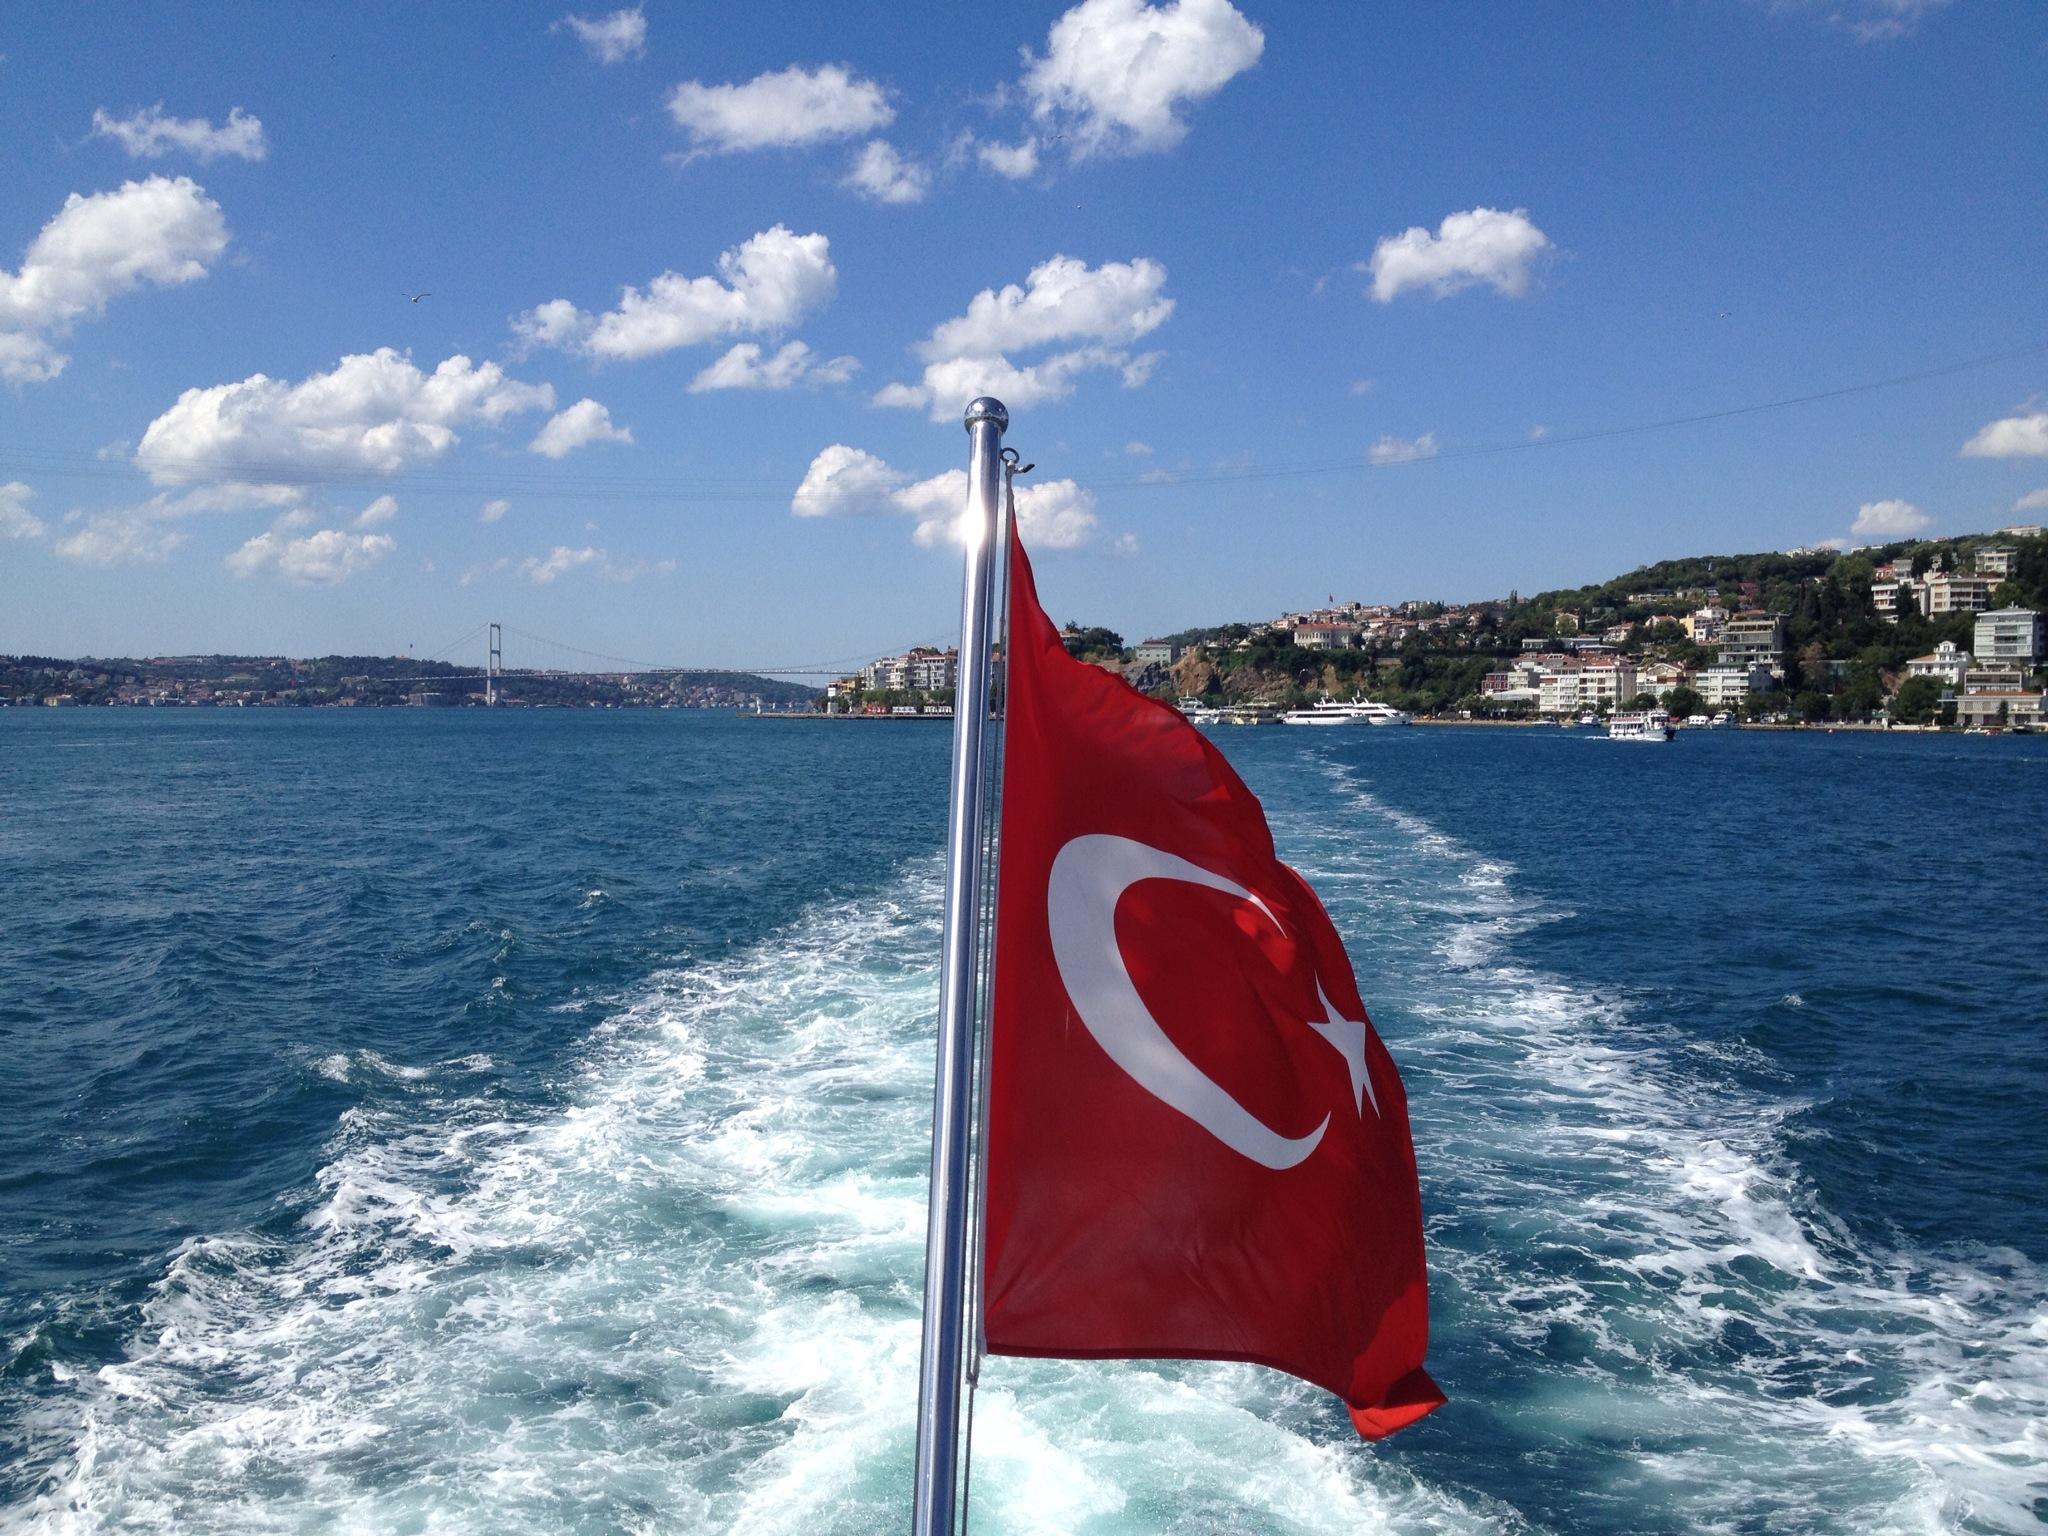 Yachting on the Bosphorus